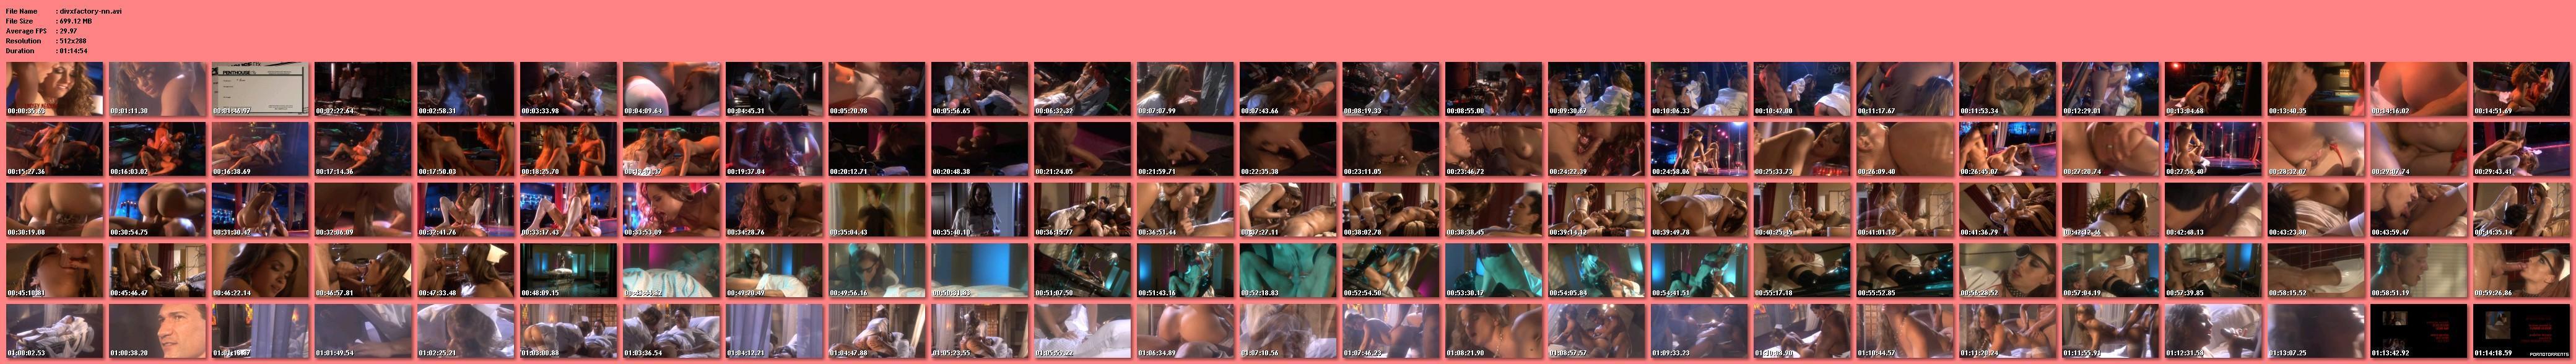 Маленькие непослушные шалуньи  14 (2001) DVDRip